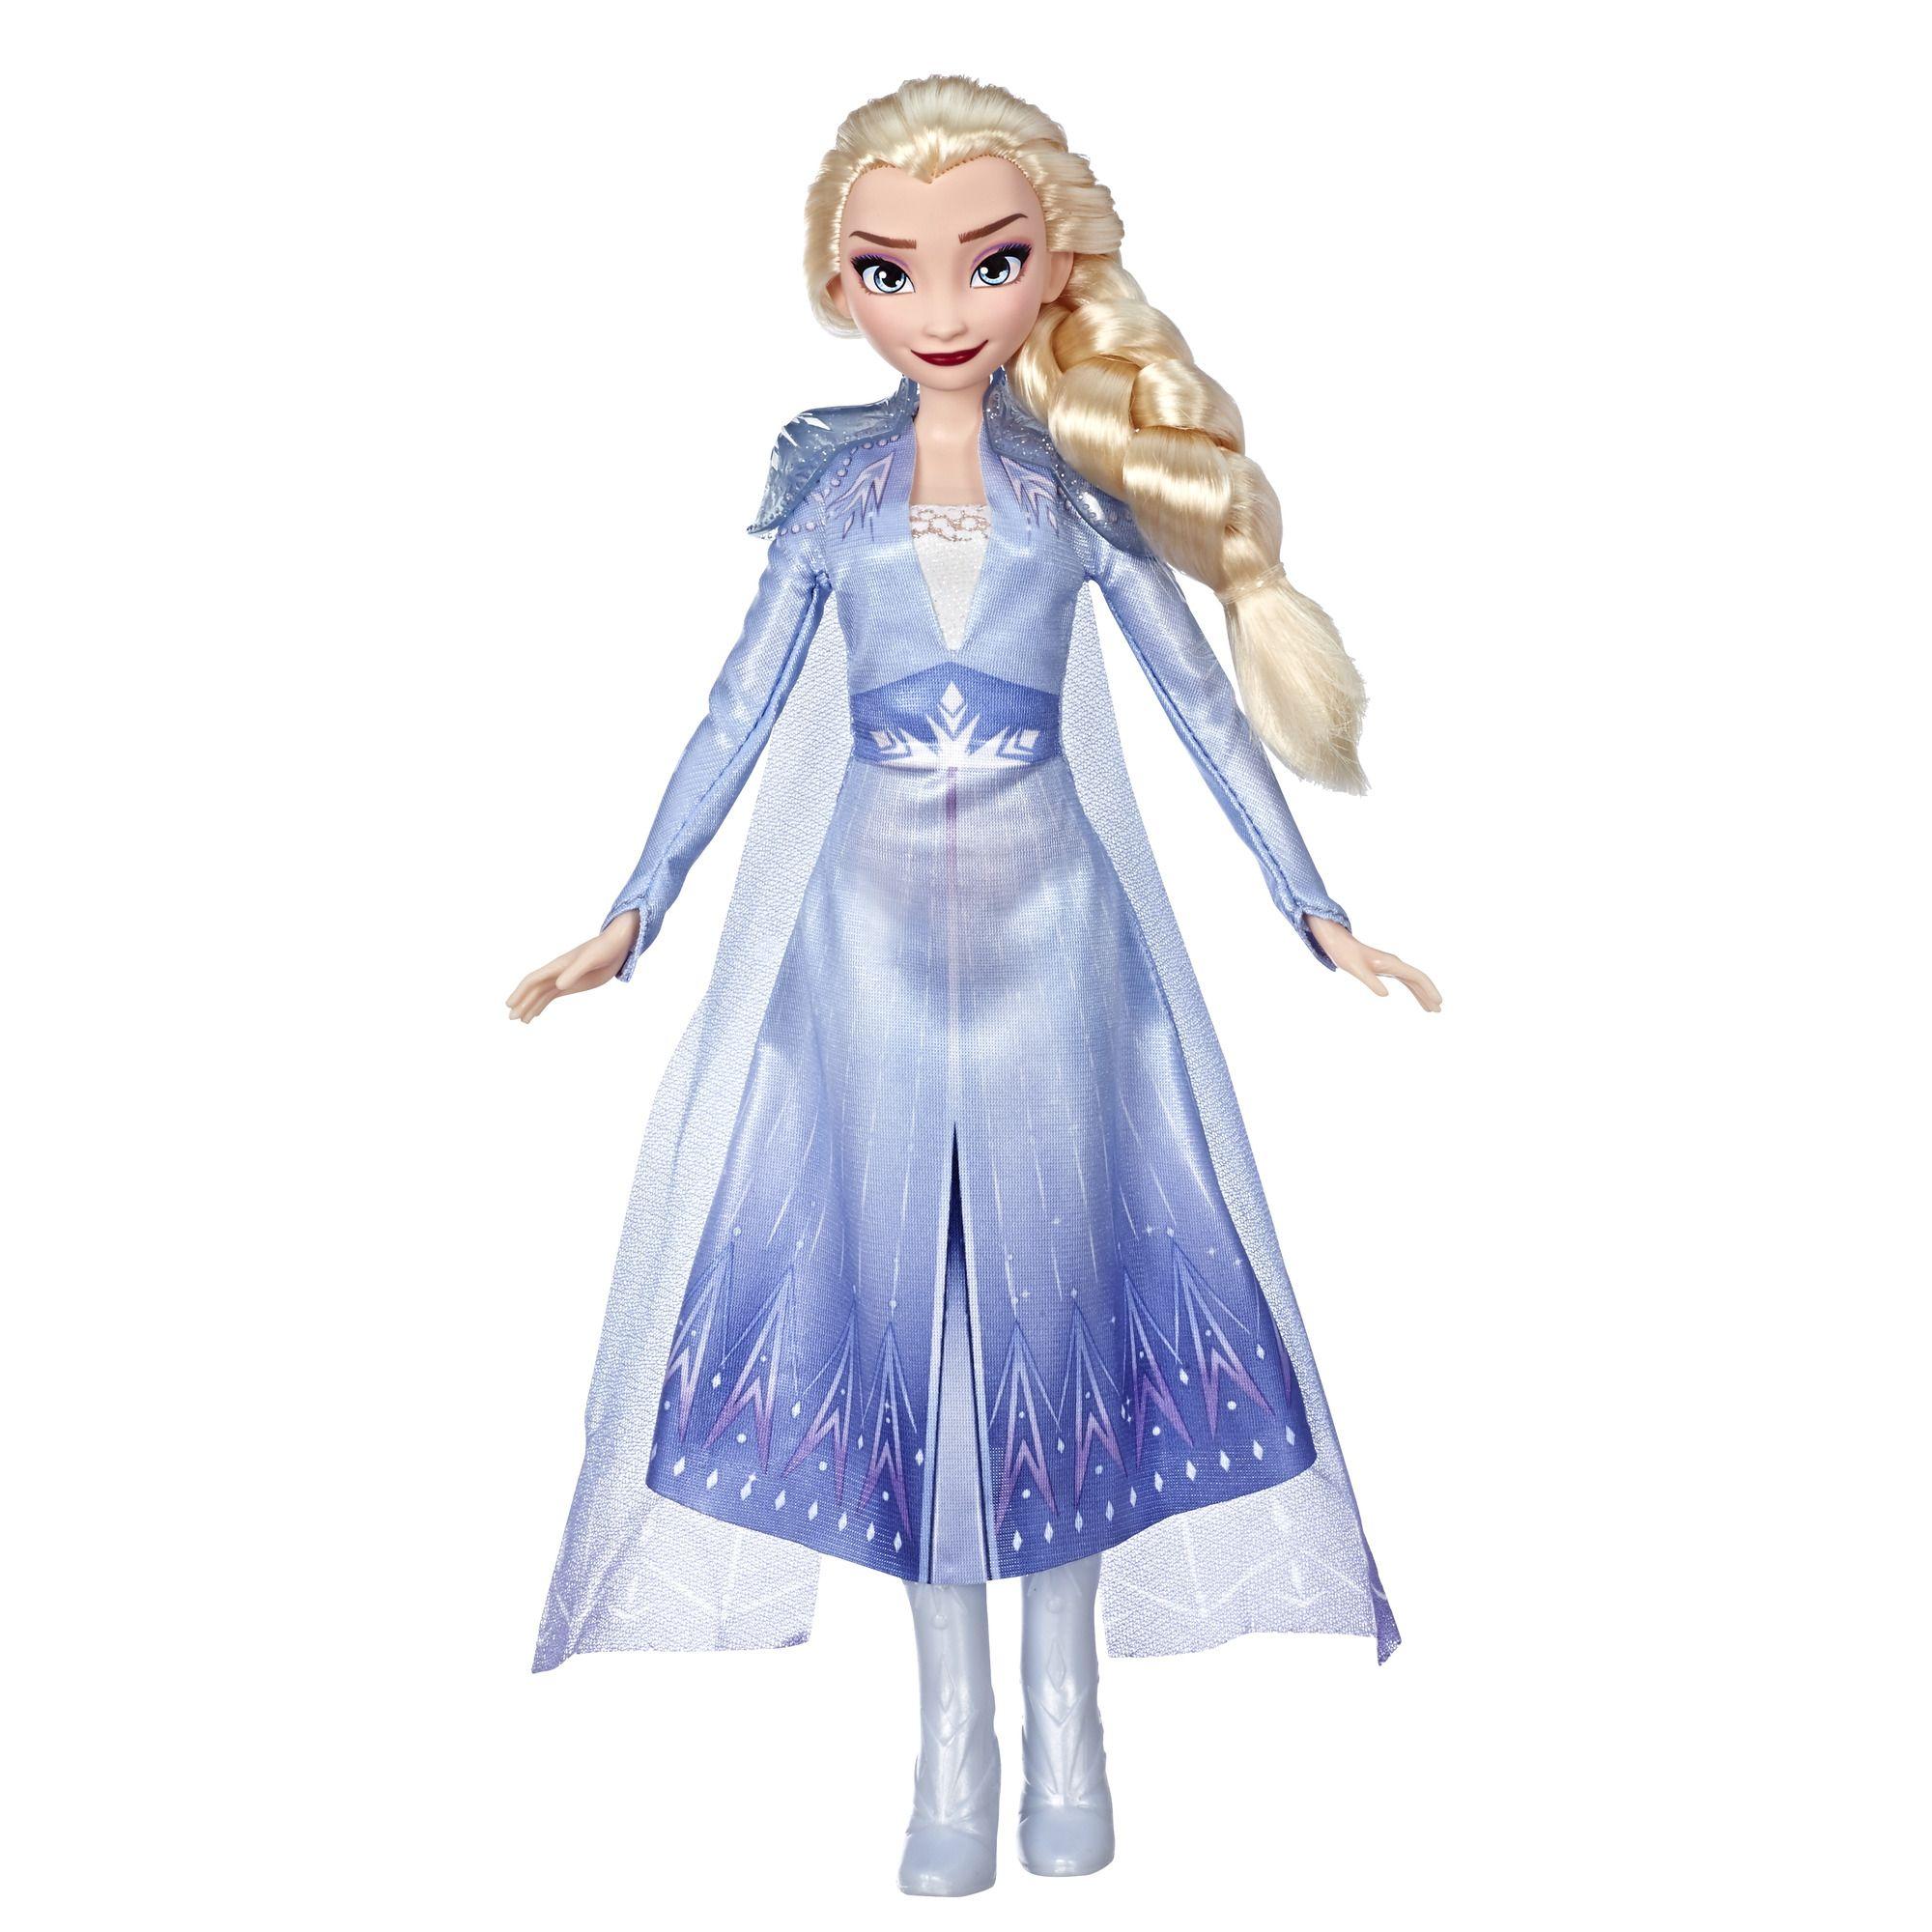 Disney Frozen 2 Elsa Fashion Doll With Long Blonde Hair Blue Outfit Walmart Com Disney Frozen Toys Elsa Doll Frozen Toys